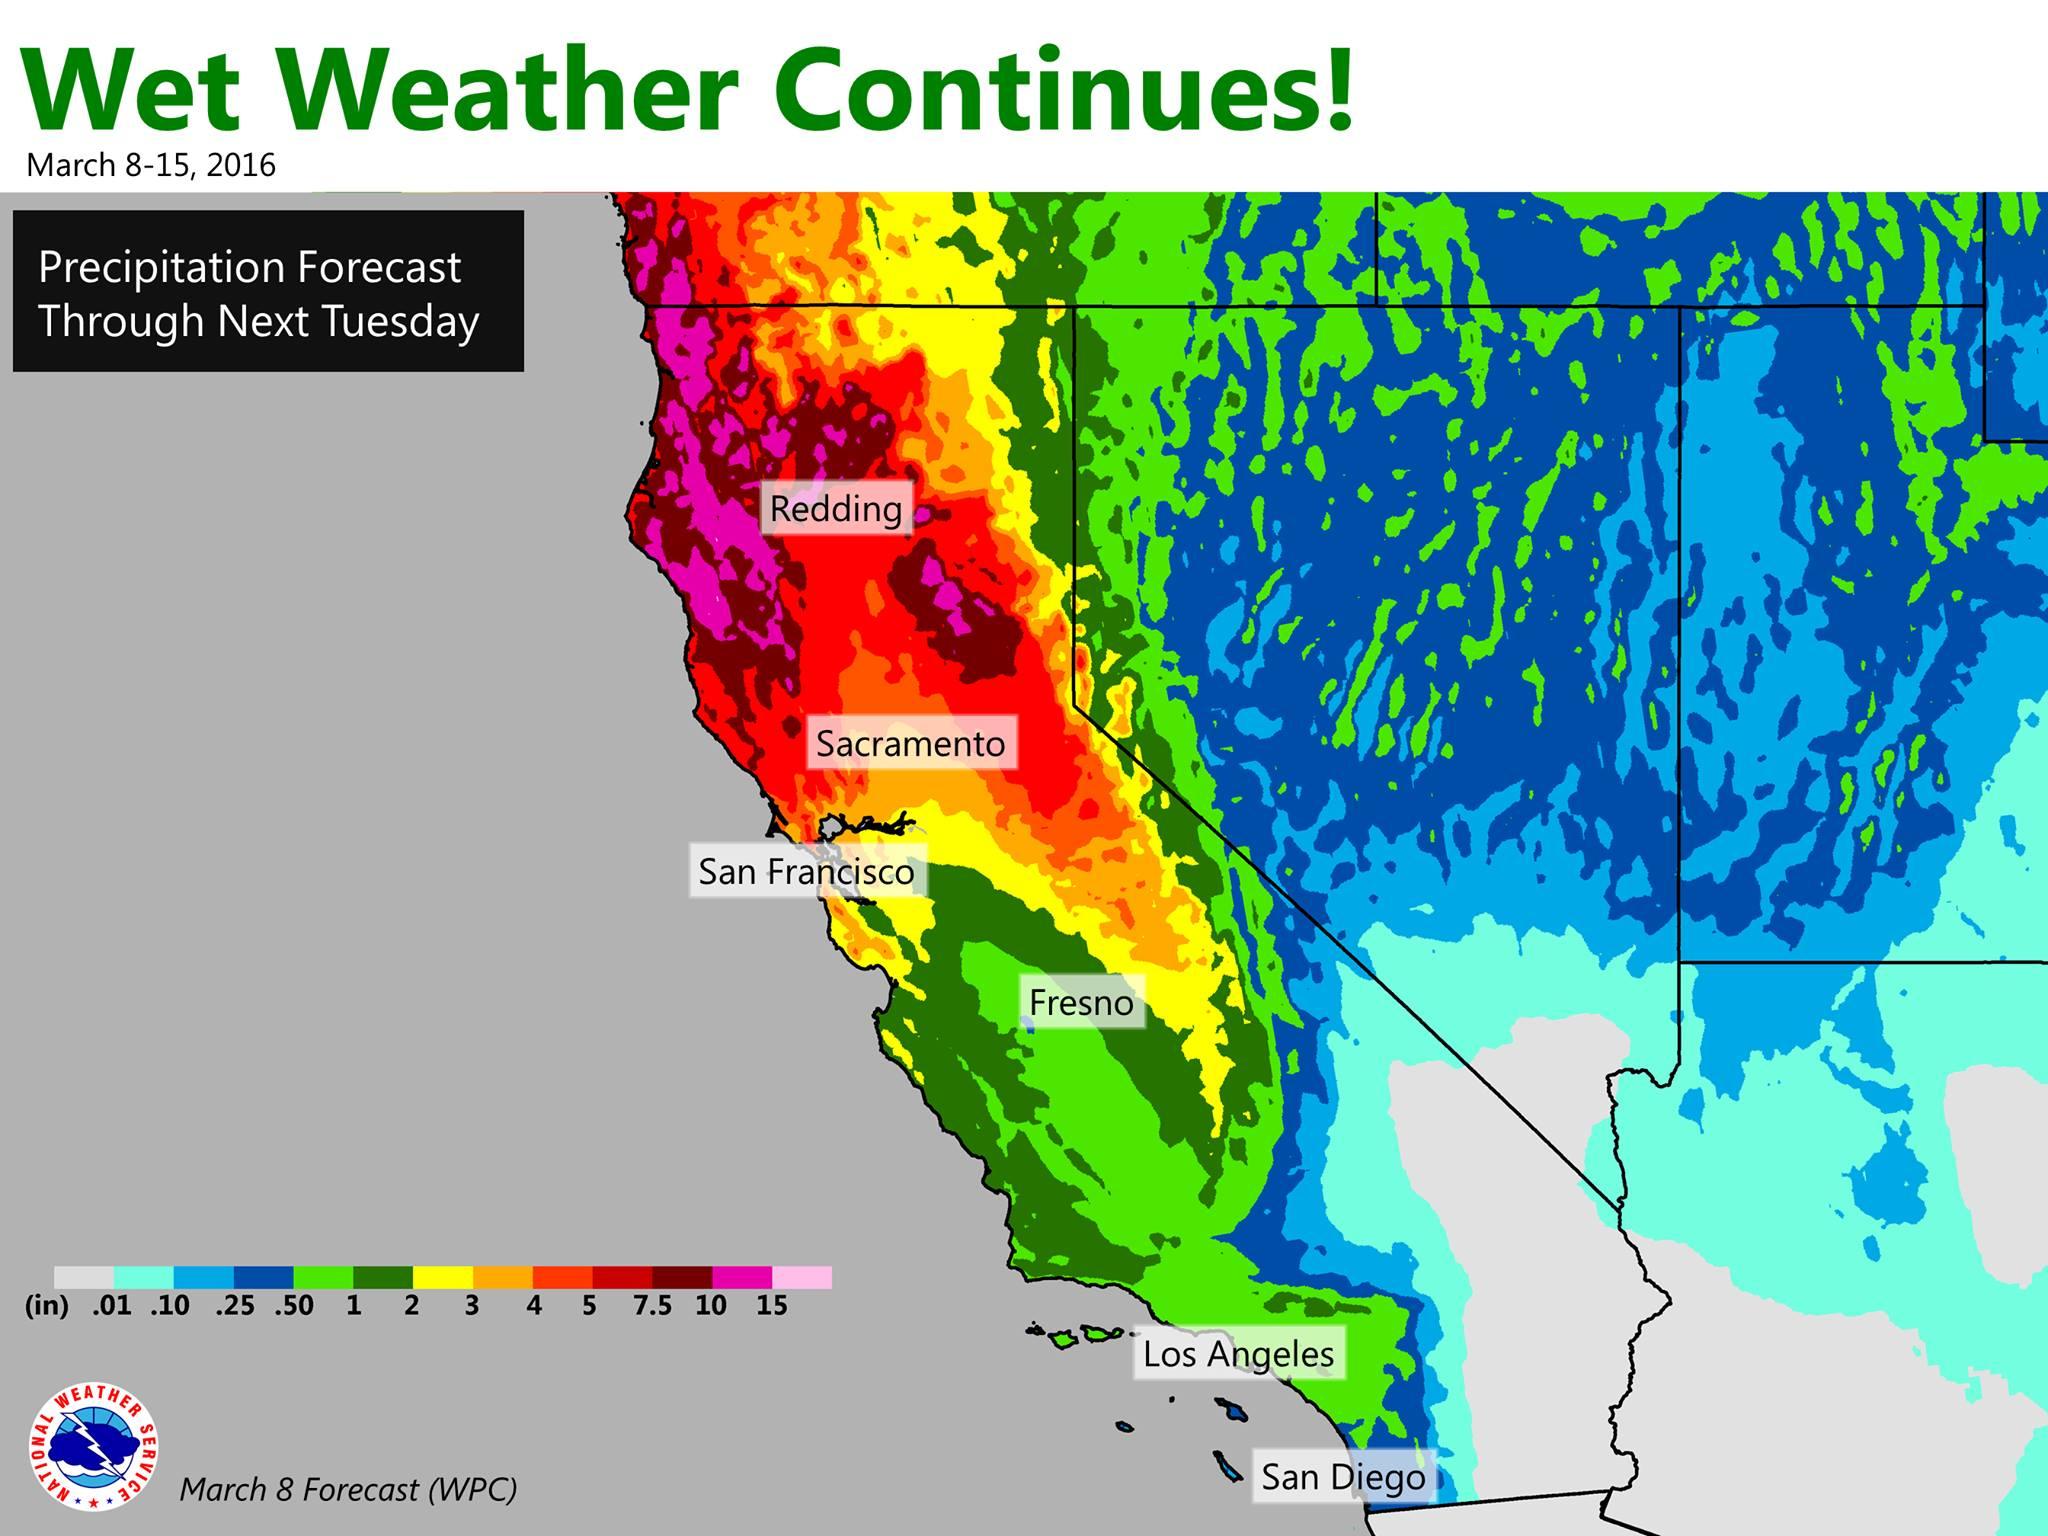 O Maps Of California California Weather Map Forecast - Klipy - California Weather Map